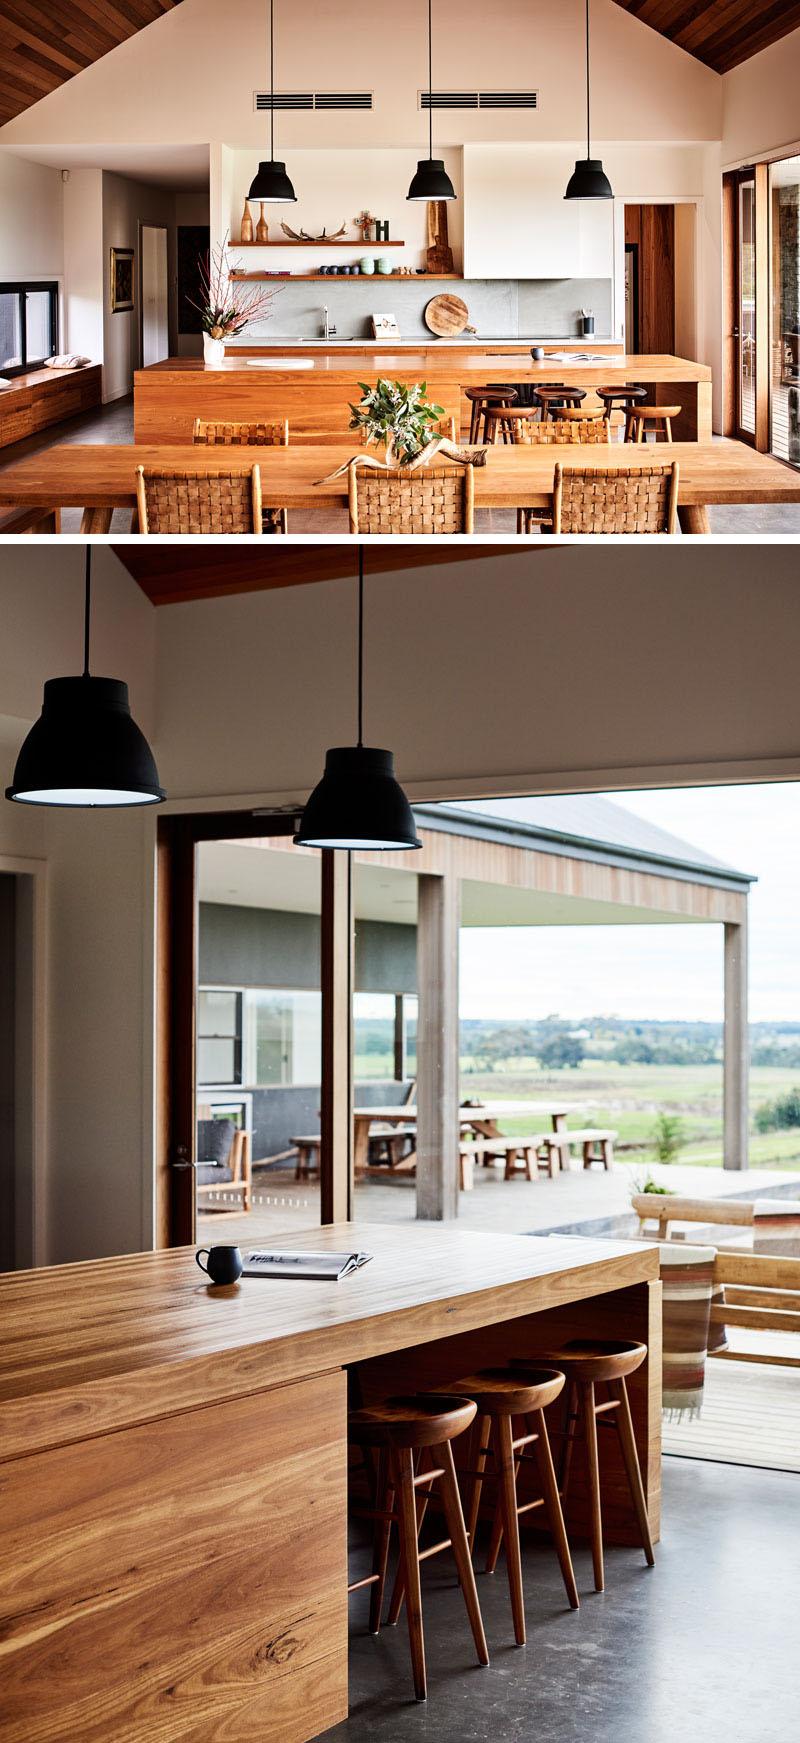 modern-wood-kitchen-and-island-111017-1241-04 (1)